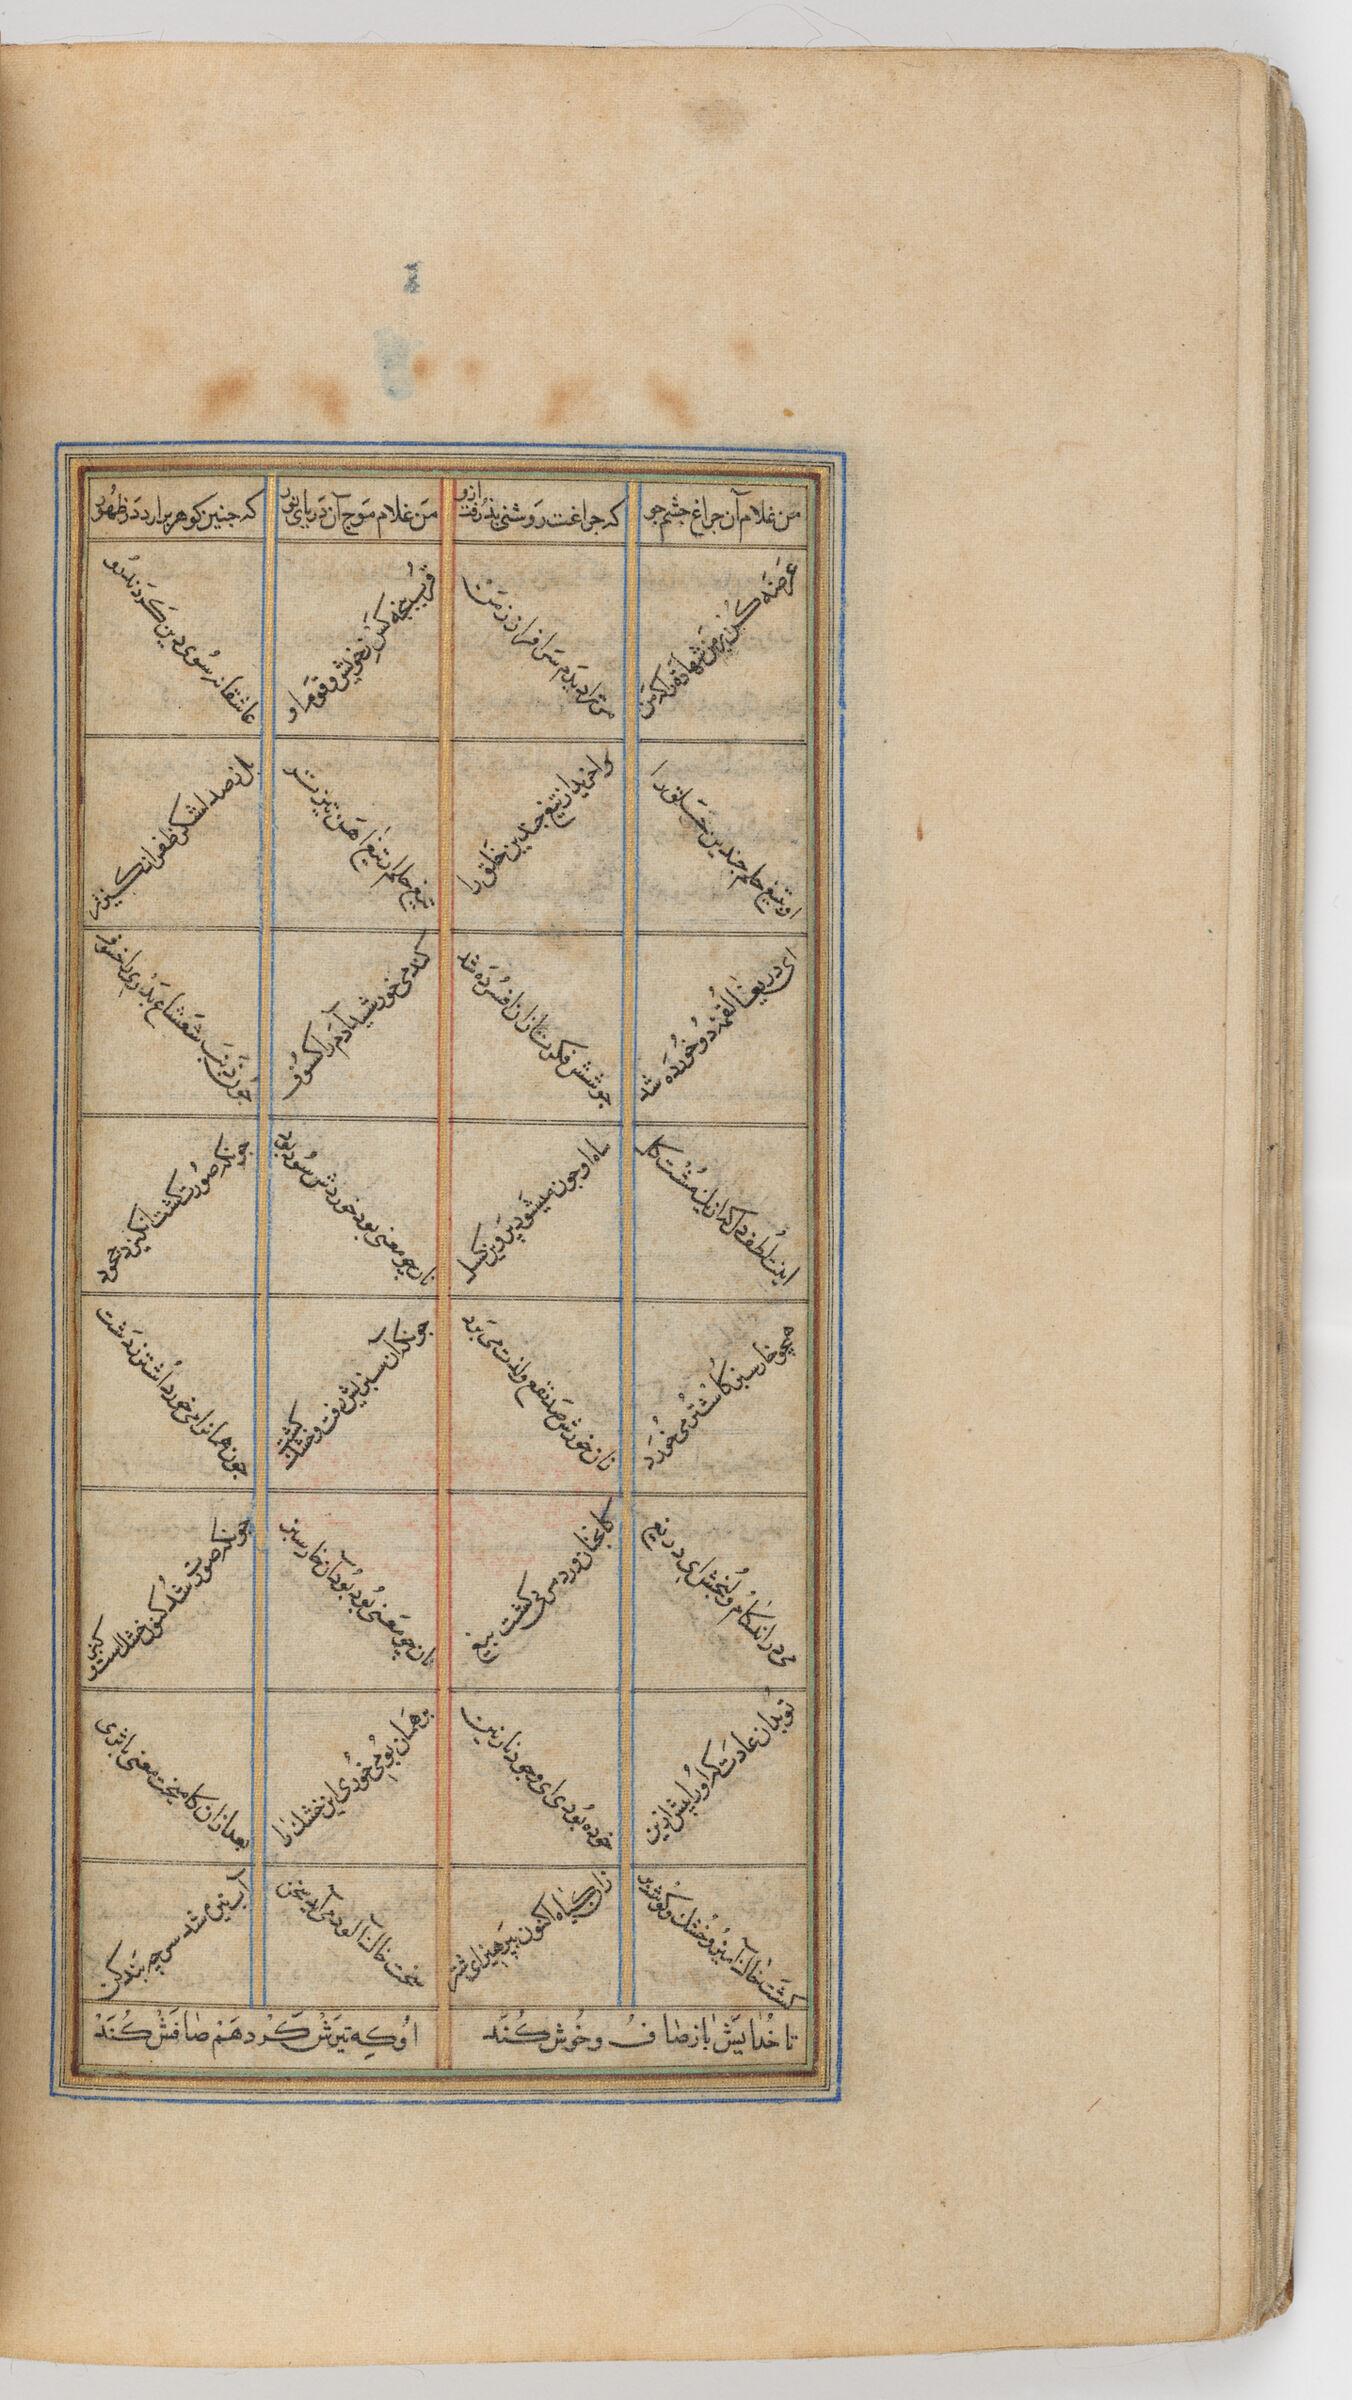 Text Folio (Text Recto; Text Verso Of Folio 47), From A Manuscript Of The Mathnavi Ma'navi By Maulana Jalal Al-Din Rumi